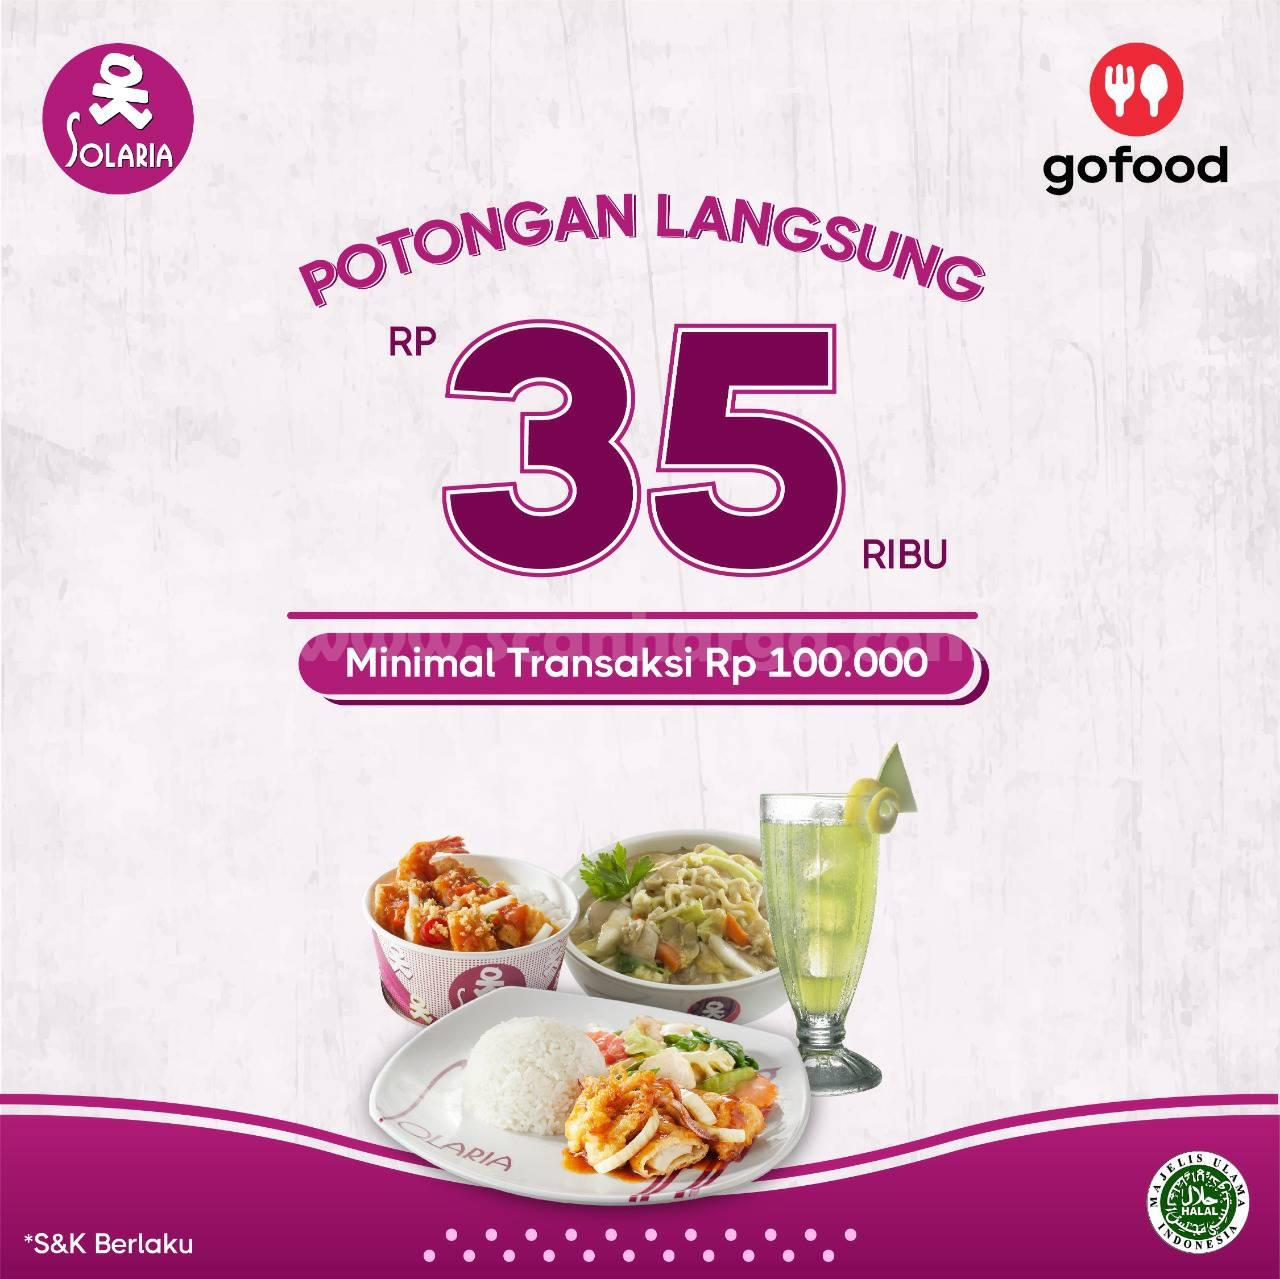 Promo Solaria Diskon Rp 35.000 Khusus pemesanan via Gofood